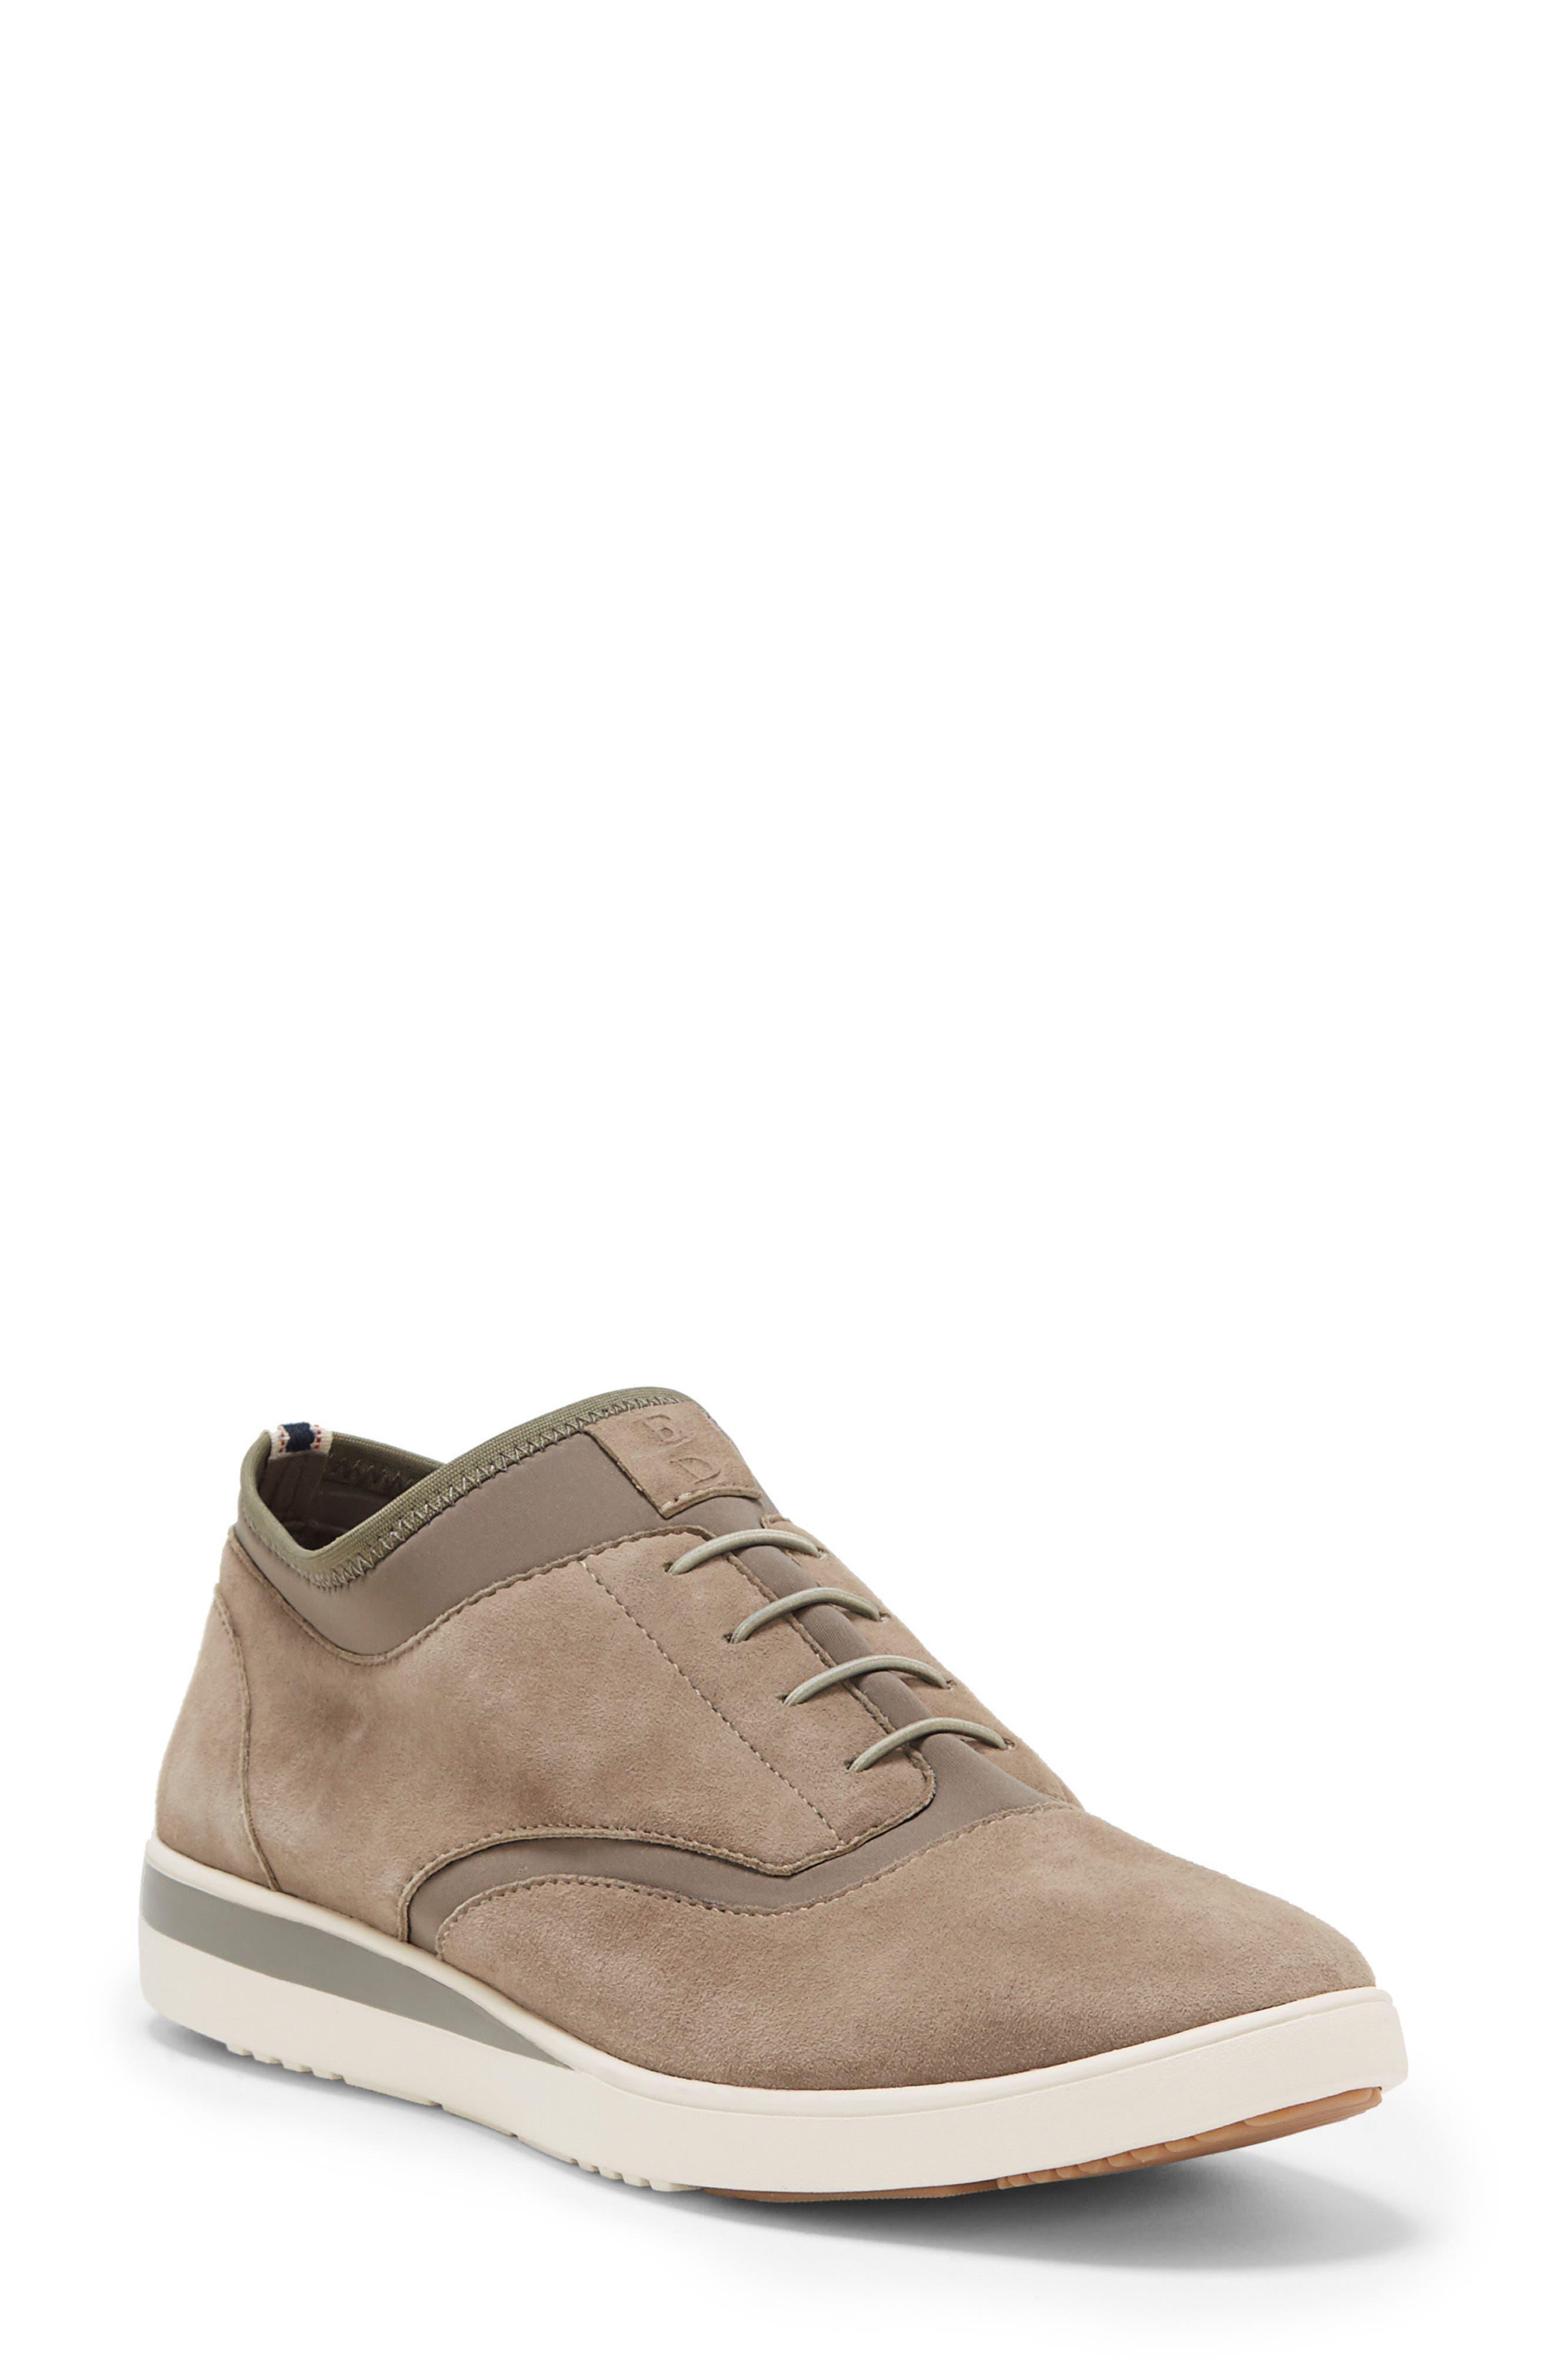 Atala Sneaker,                             Main thumbnail 1, color,                             Stone Suede